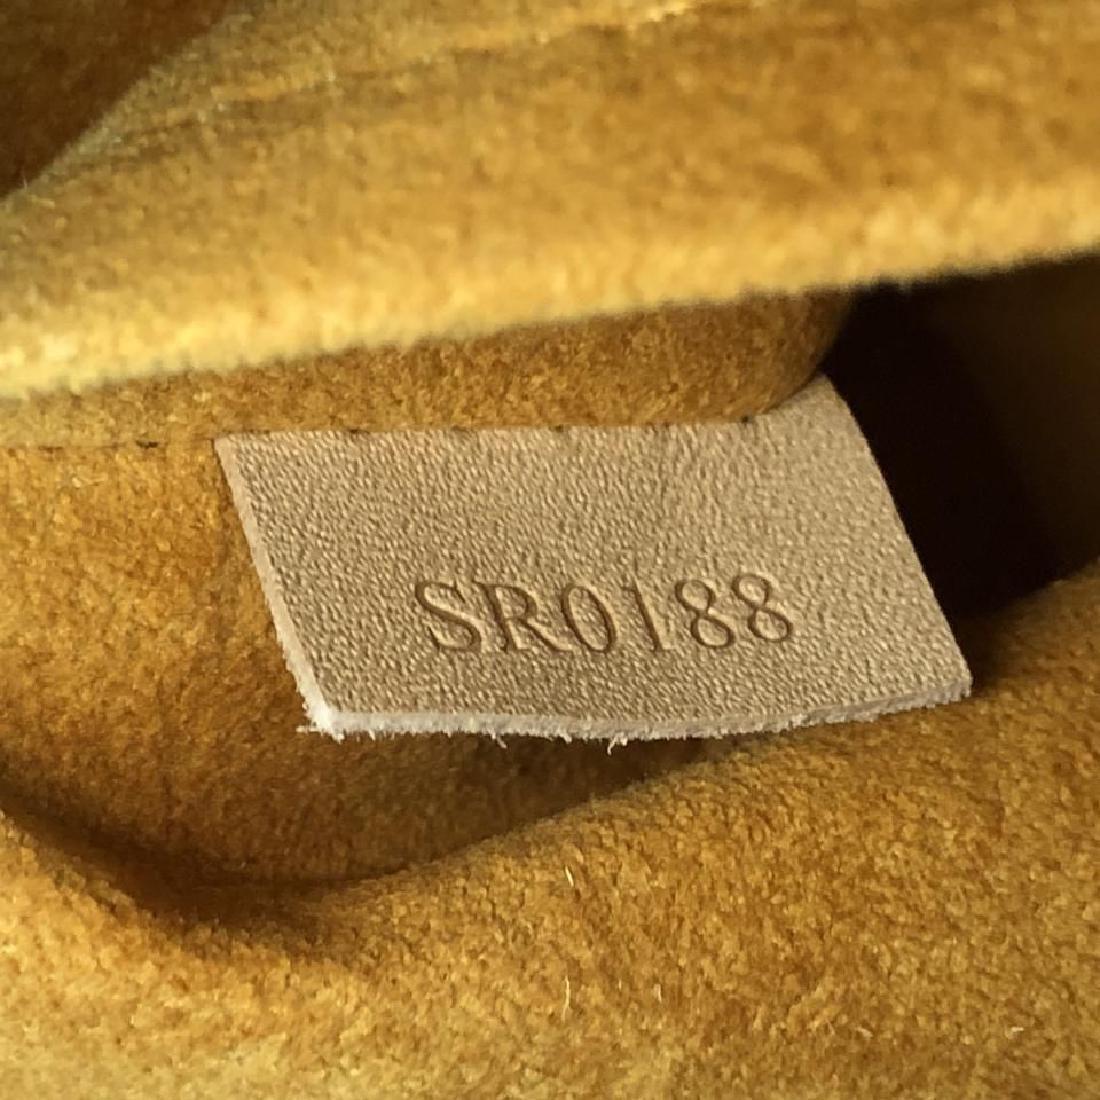 Louis Vuitton Hot Springs Vernis Monogram Backpack - 8